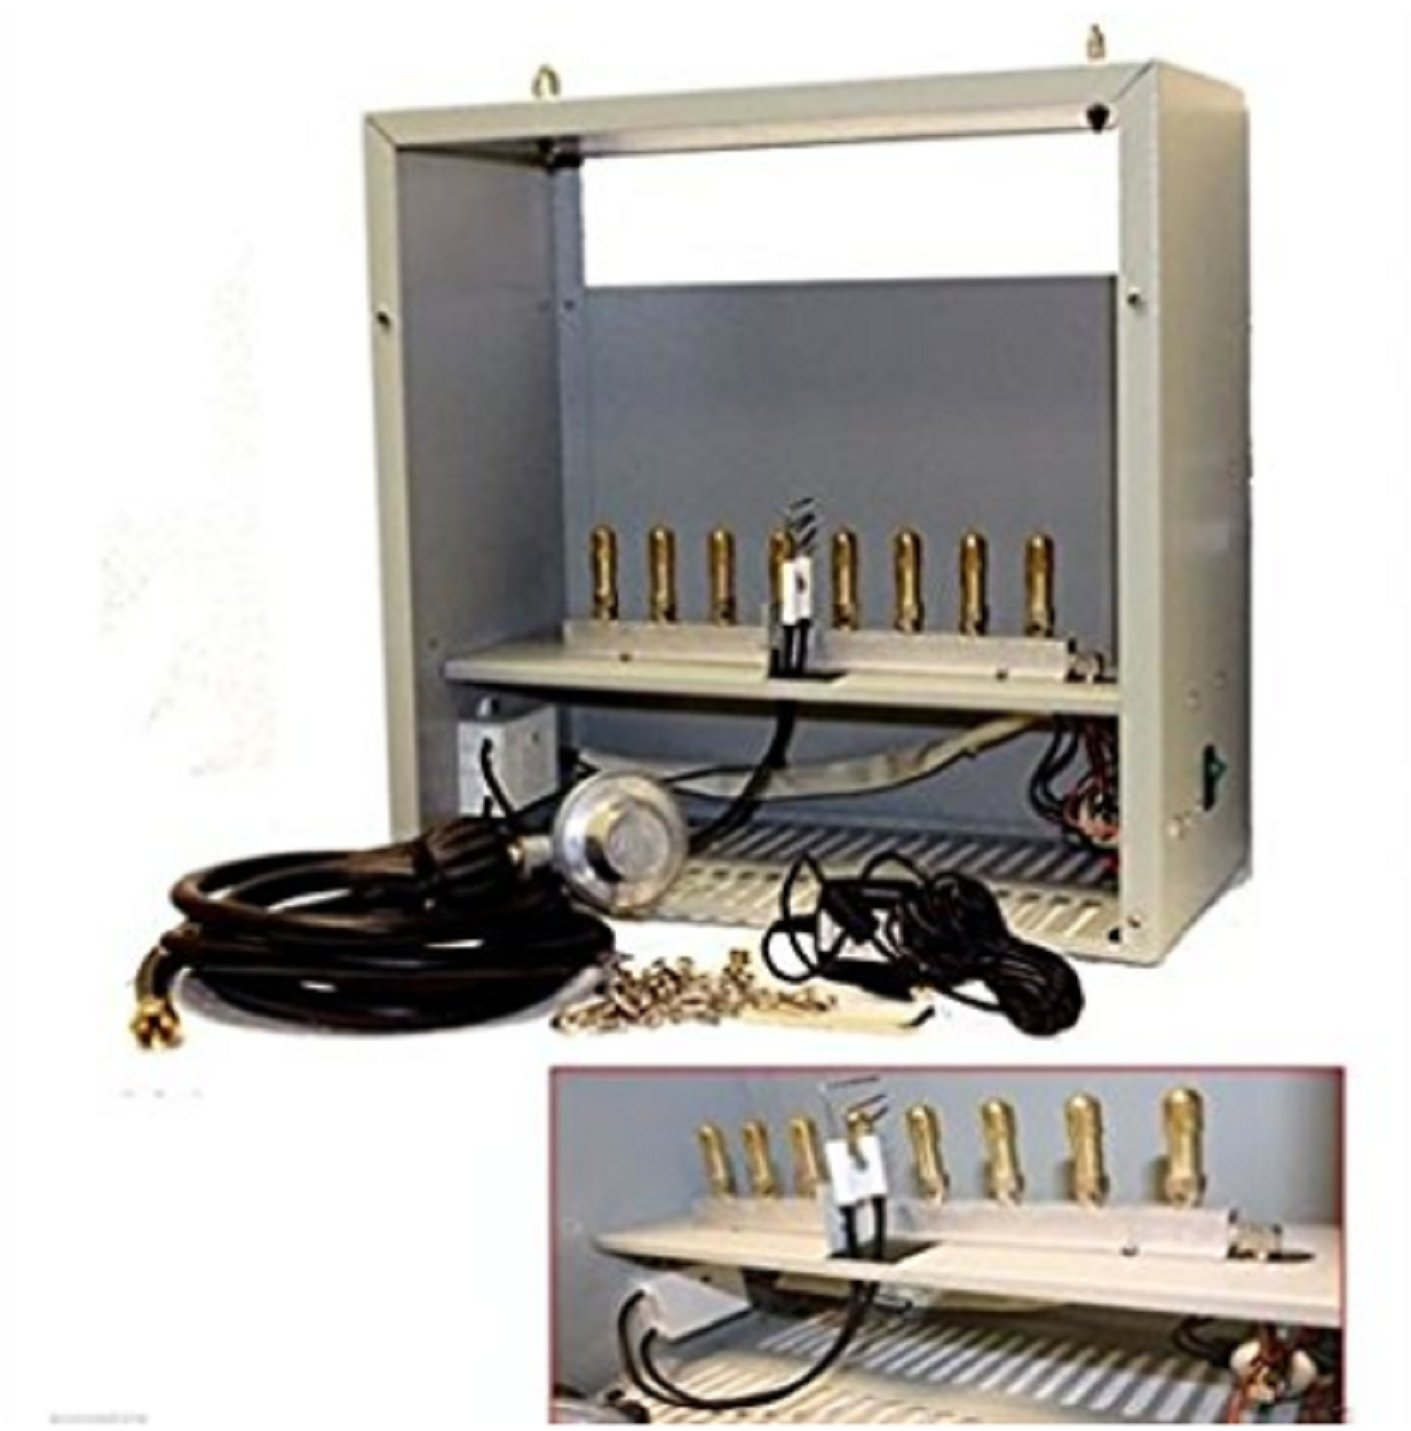 USA Premium Store Hydroponic Grow CO2 Generator 8 Burner LP Propane Gas Burners 22,400 BTU by USA Premium Store